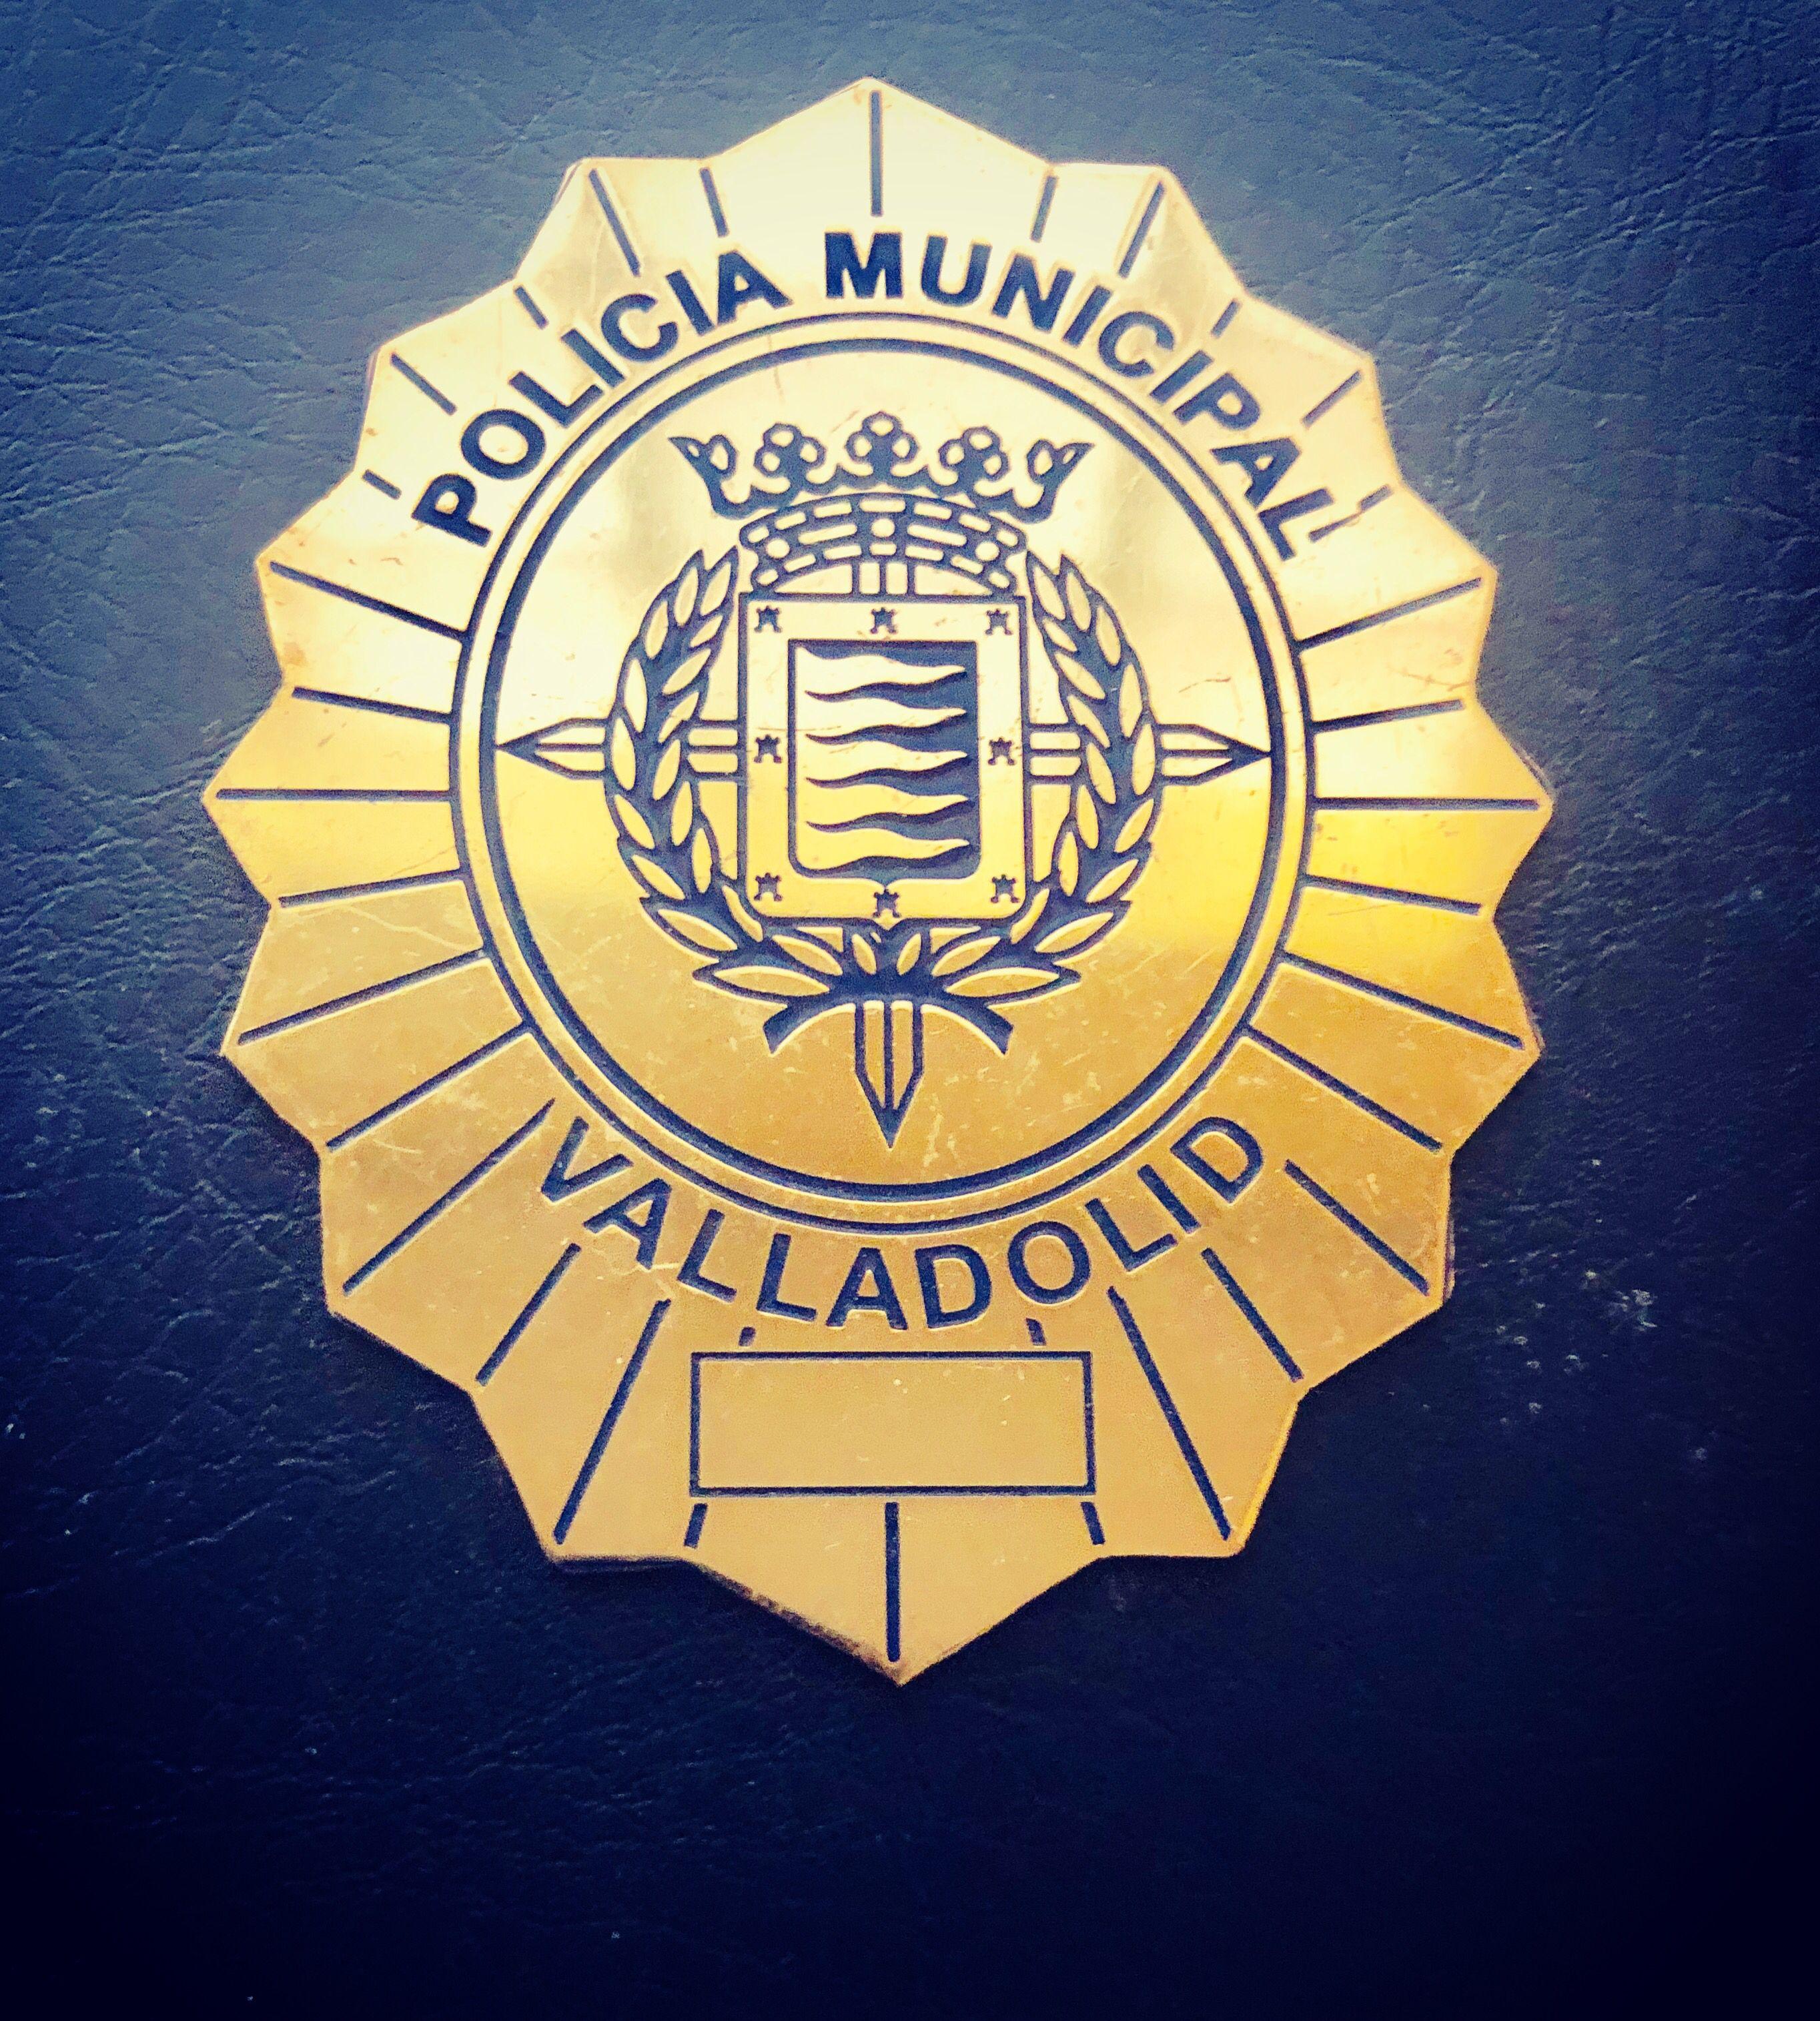 Placa Policía Valladolid Police Foriegn Personalized Items